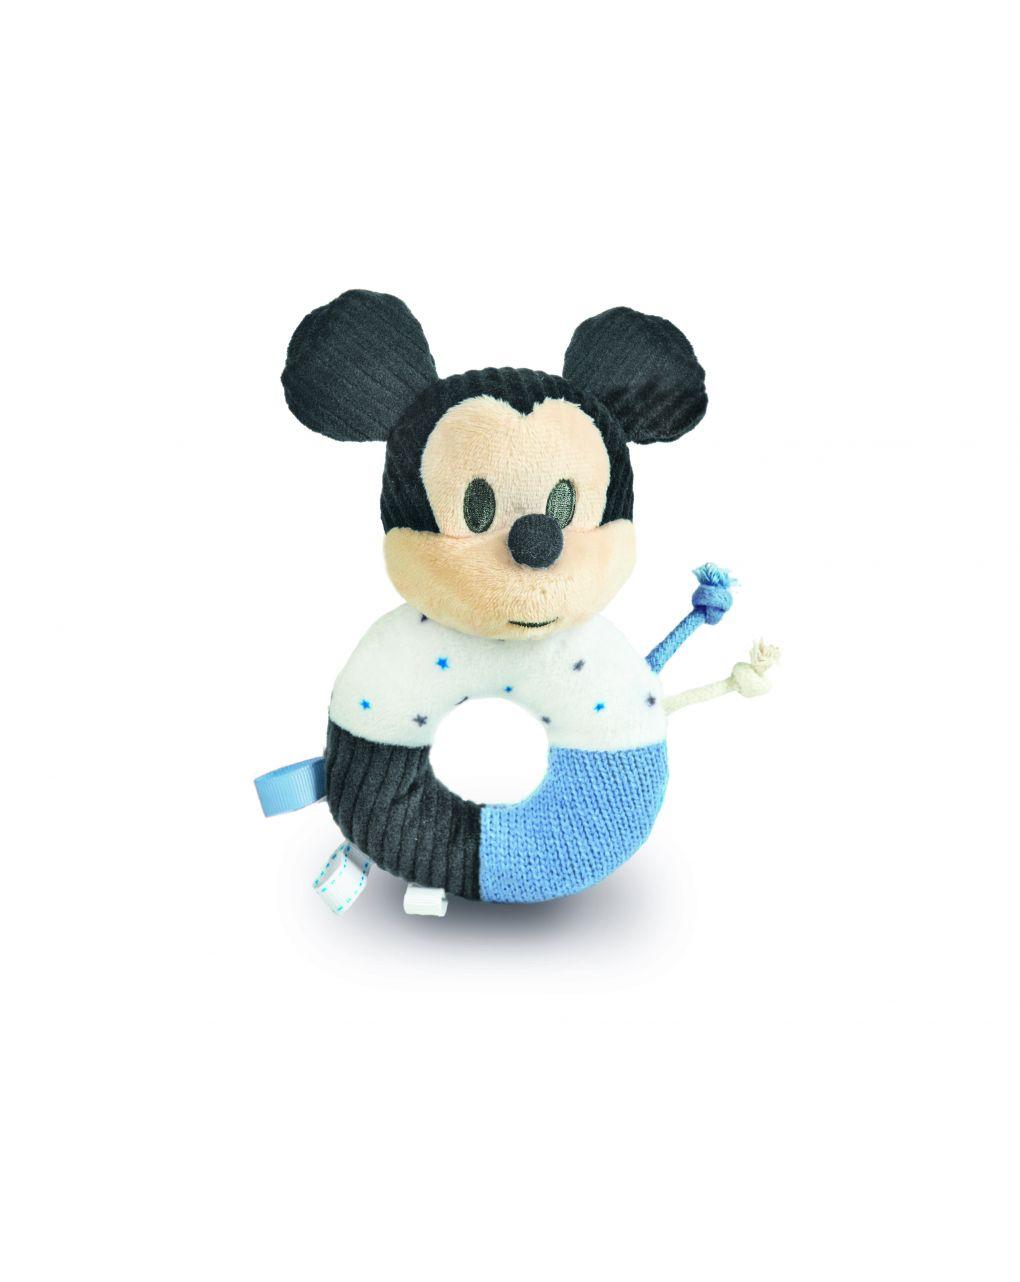 Disney baby - baby mickey morbido anello sonaglino - Clementoni